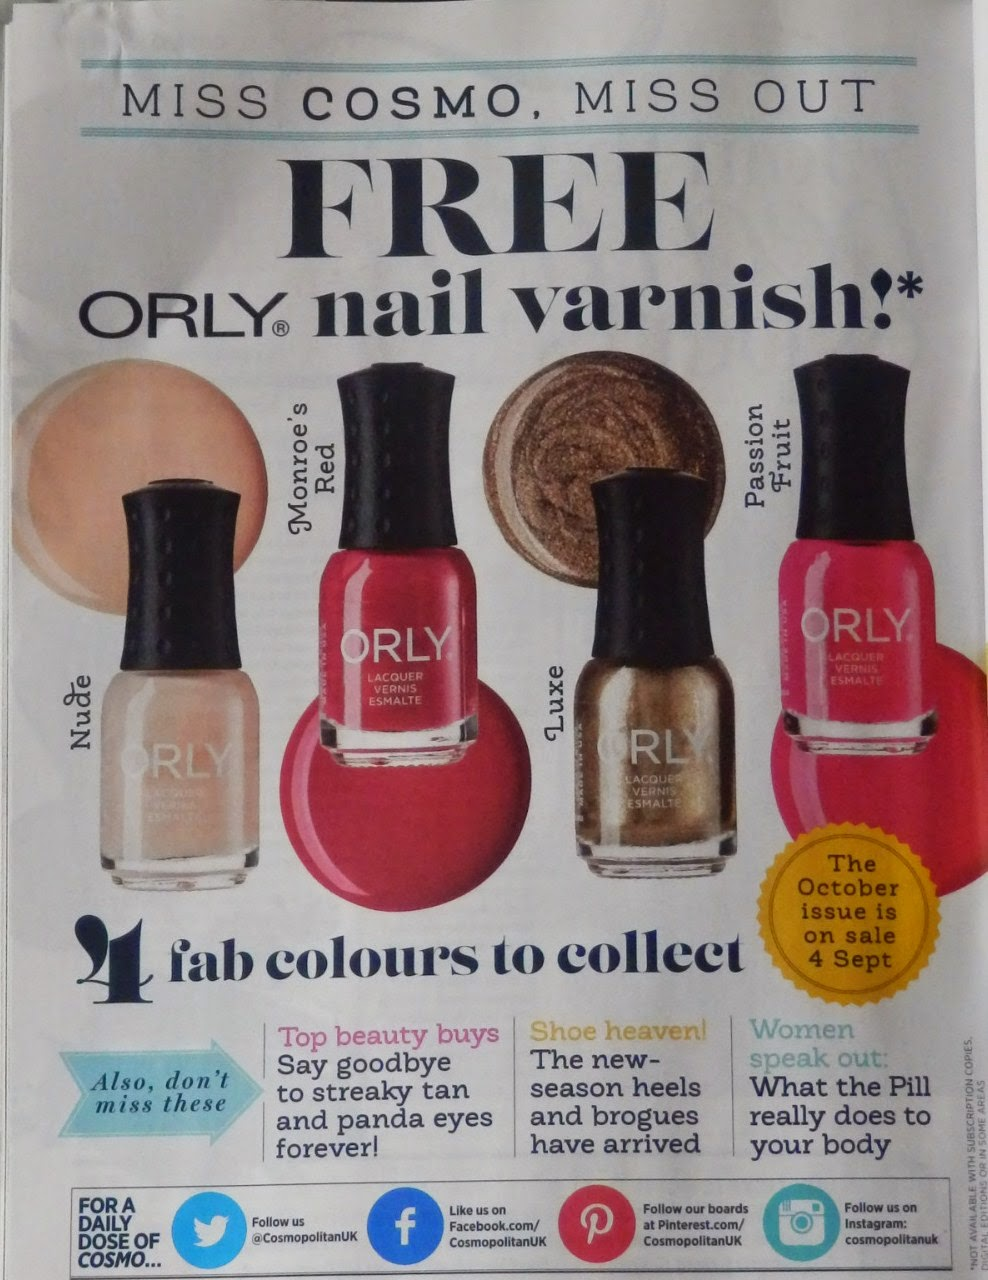 Cosmopolitan Magazine Freebie - Orly Nail Polish